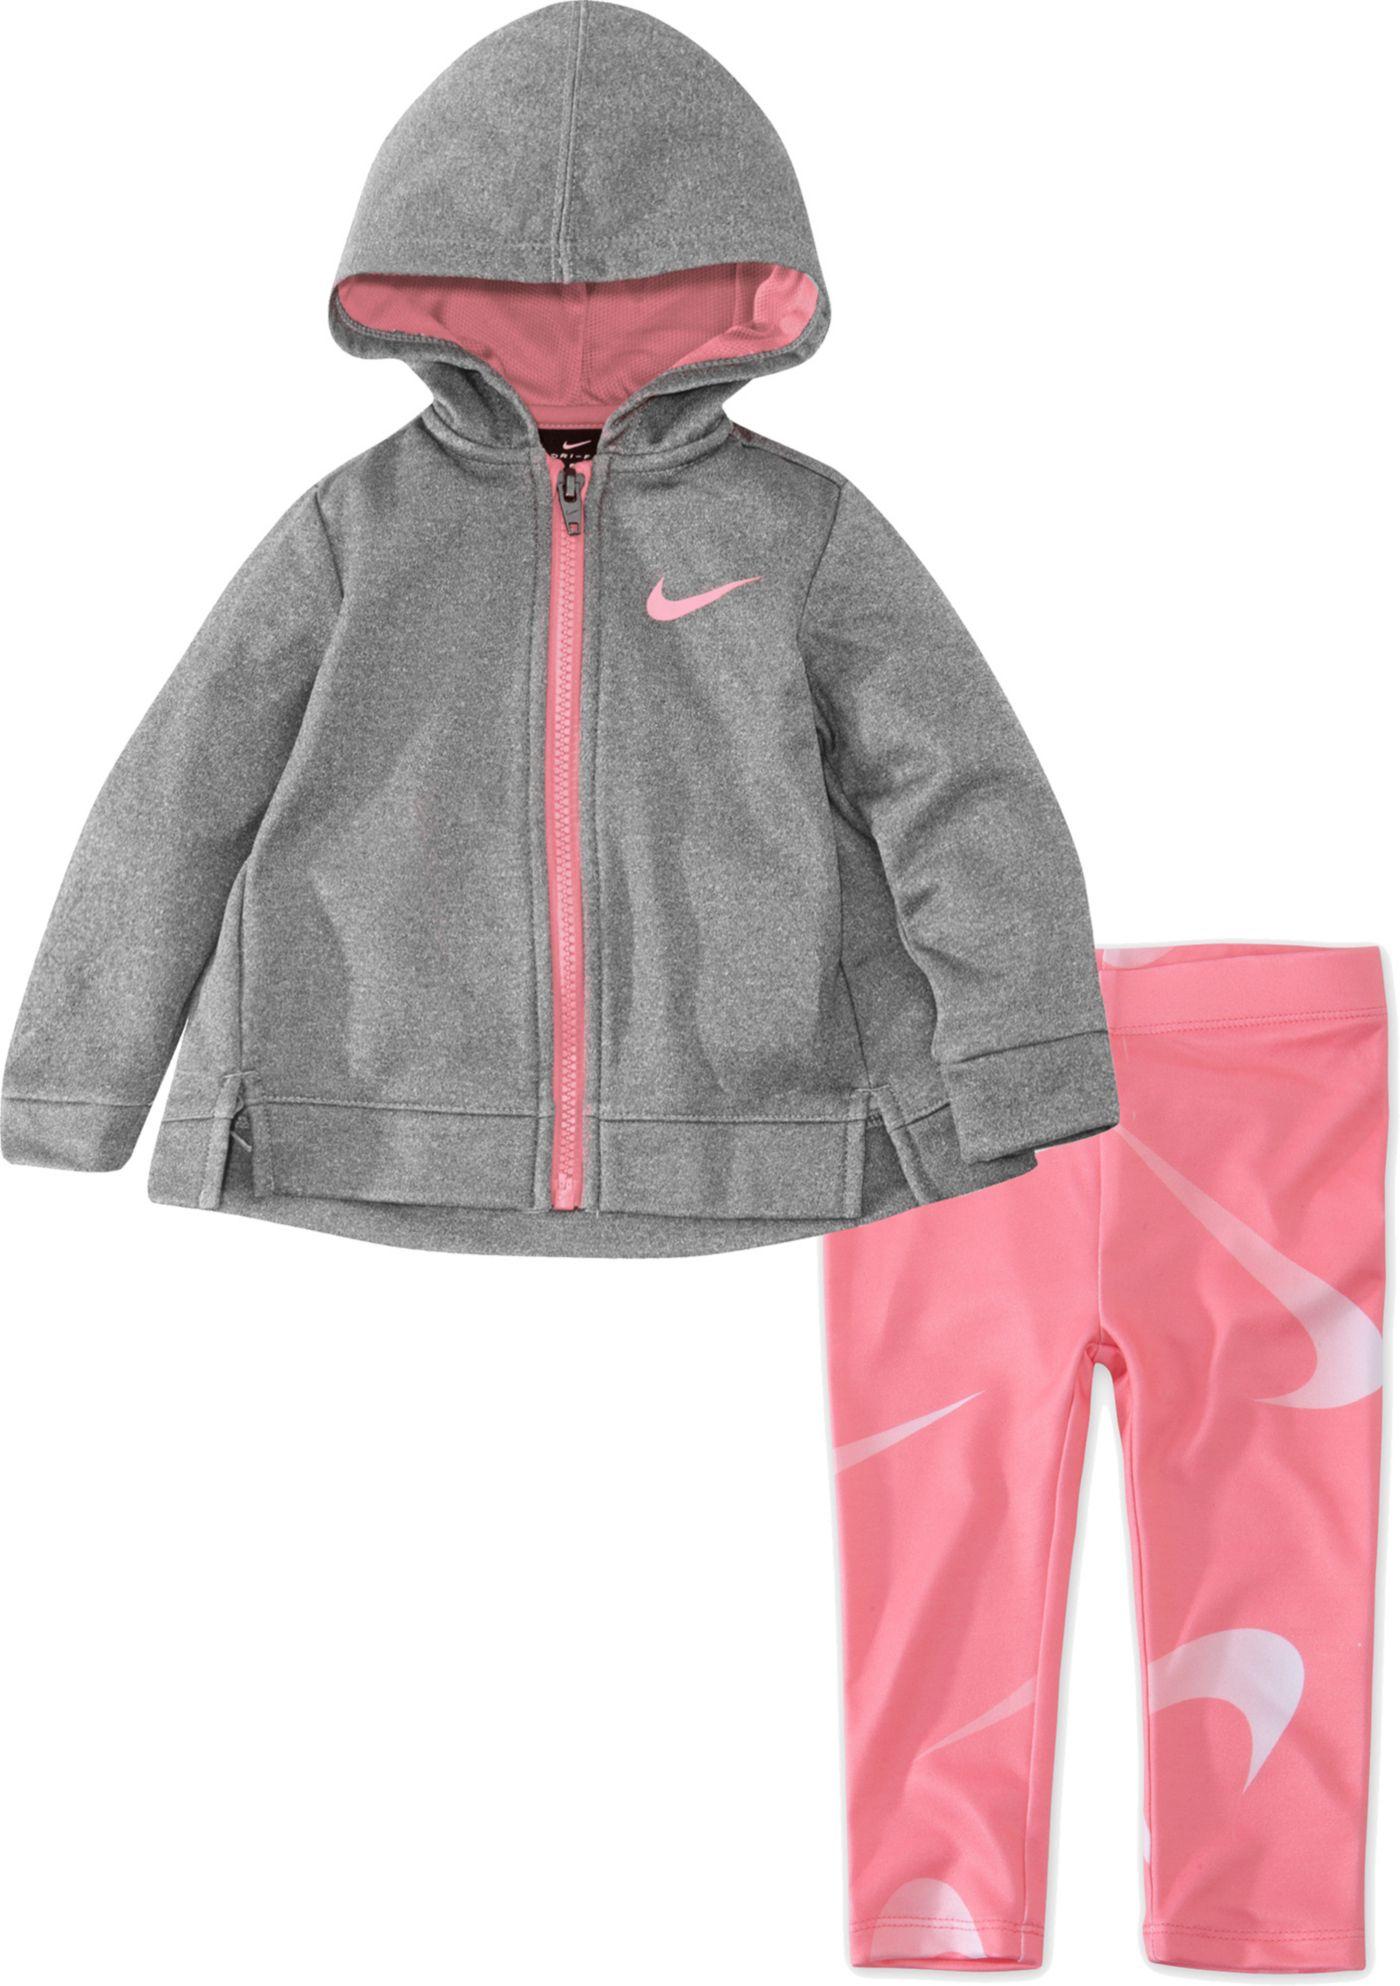 Nike Toddler Girls' Therma Fleece Zip Hoodie and Dri-FIT Leggings Set